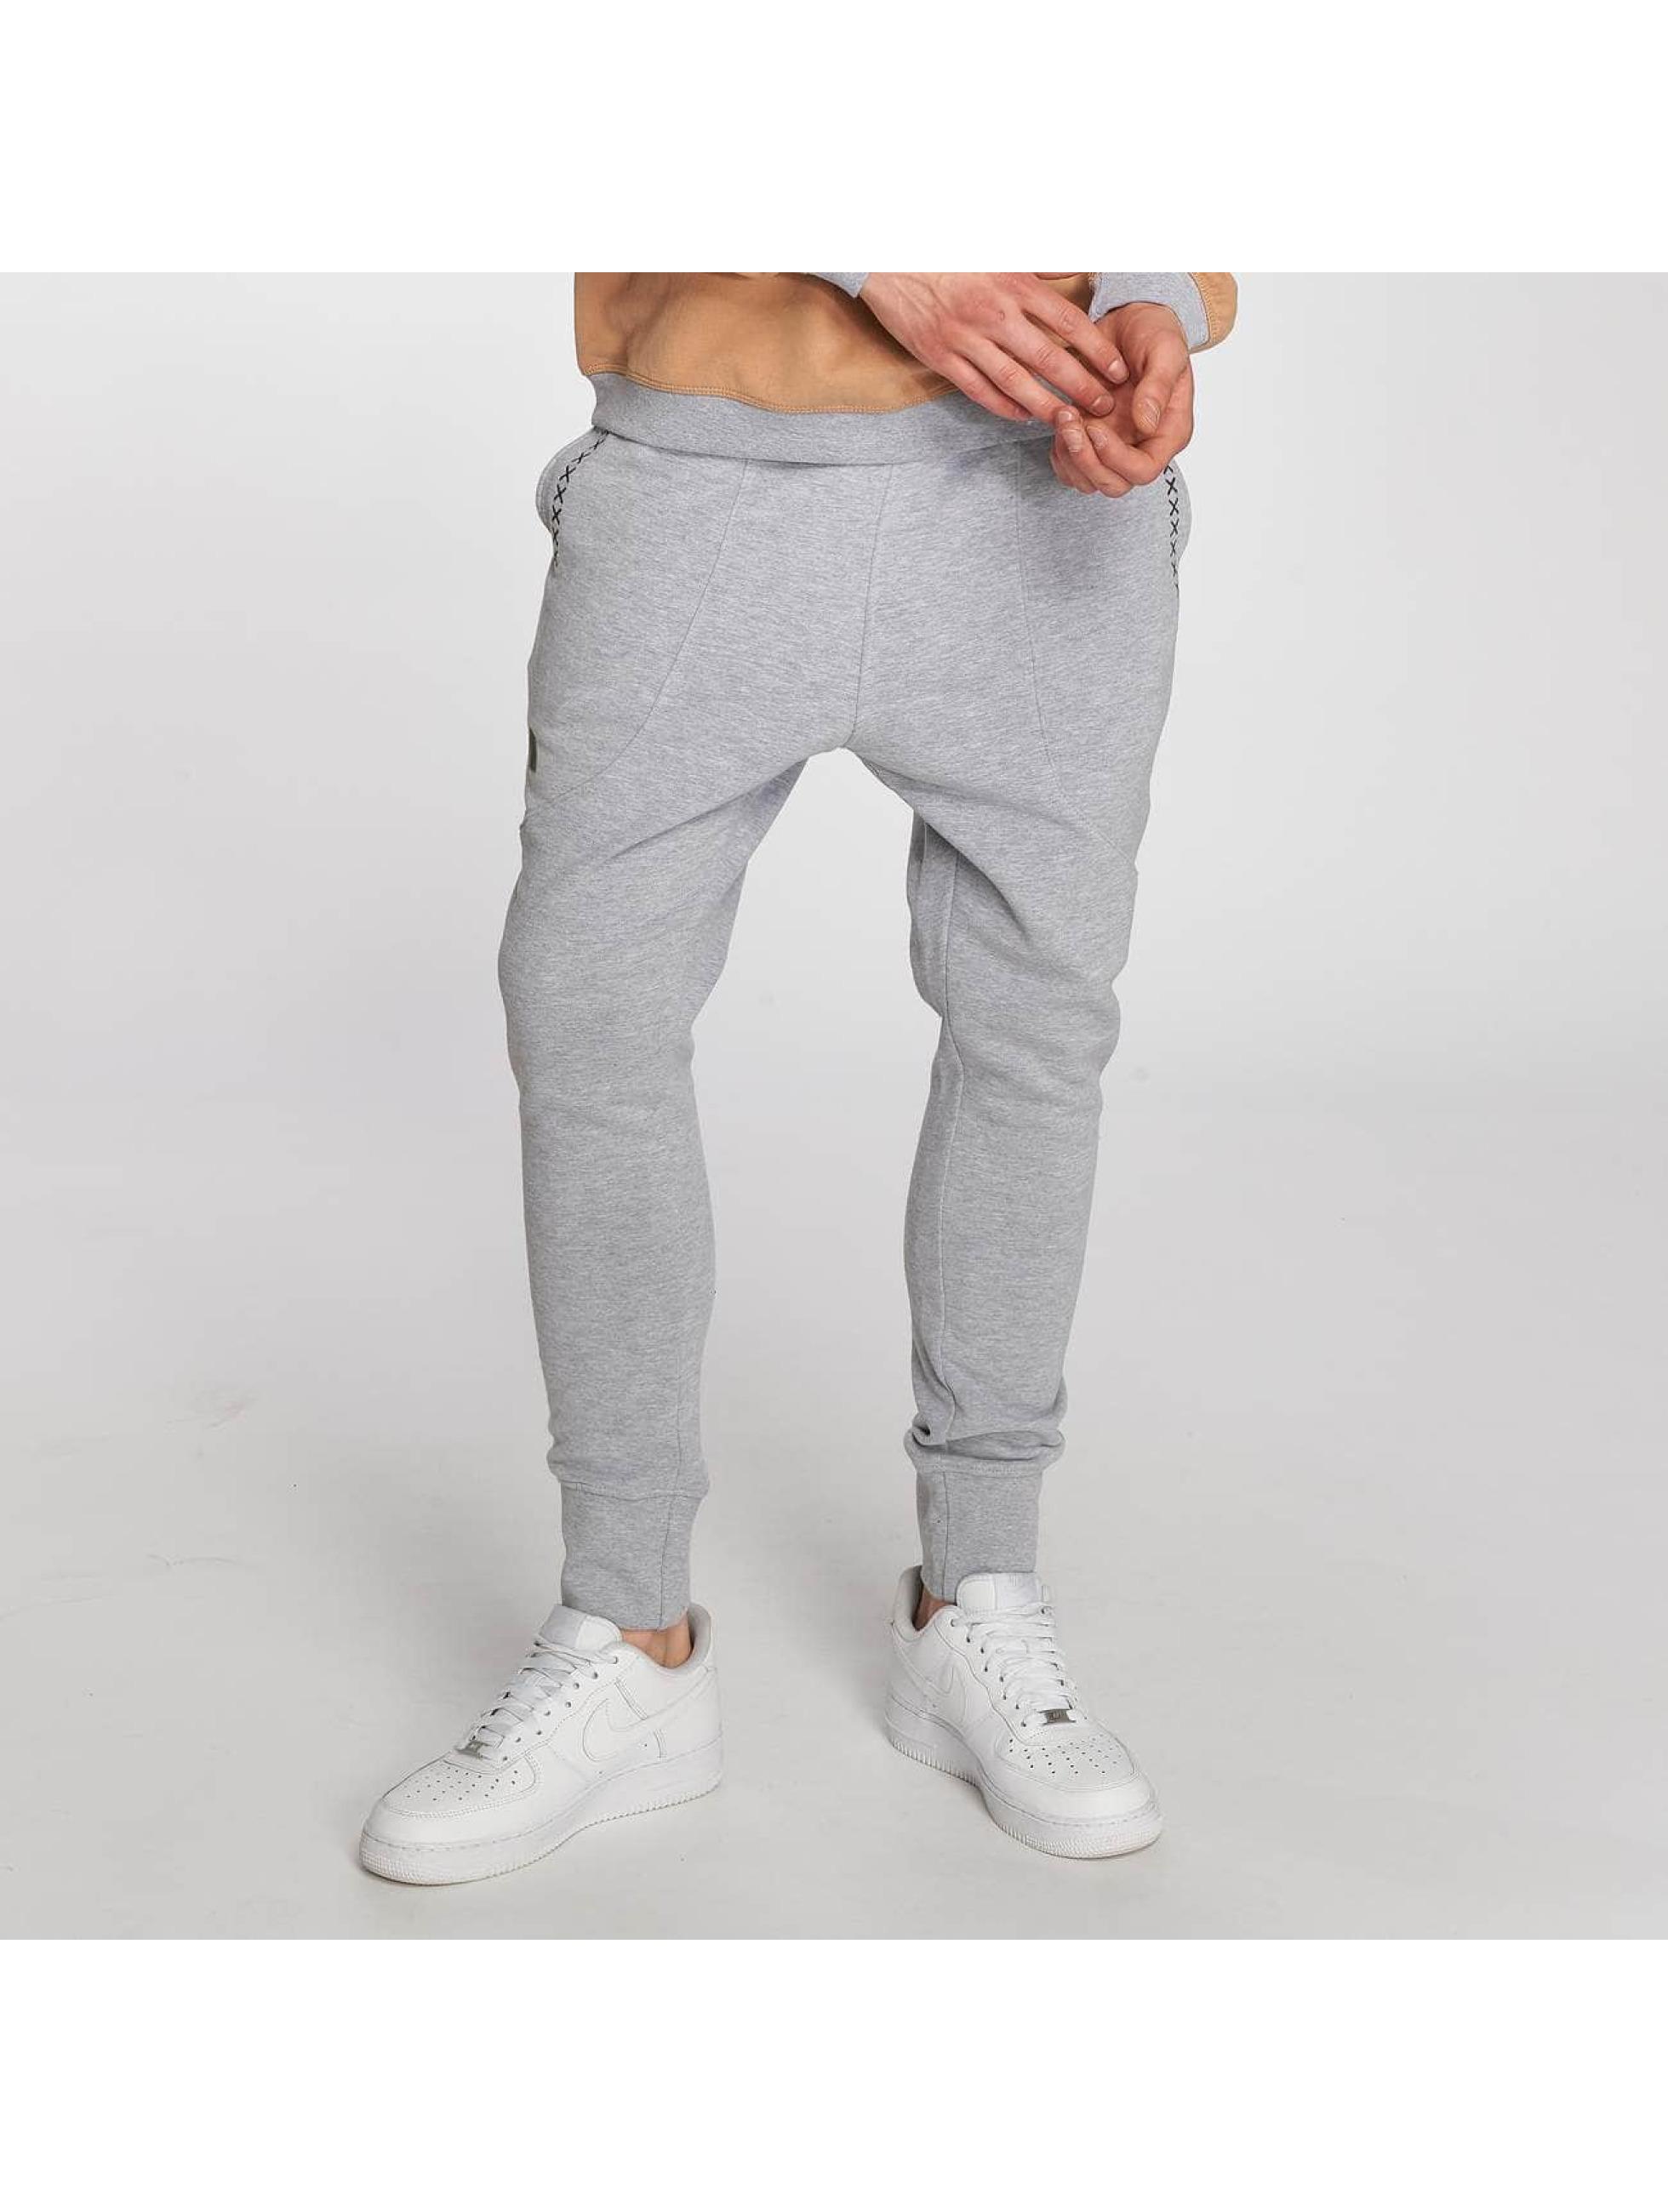 Just Rhyse / Sweat Pant Skagway in gray M